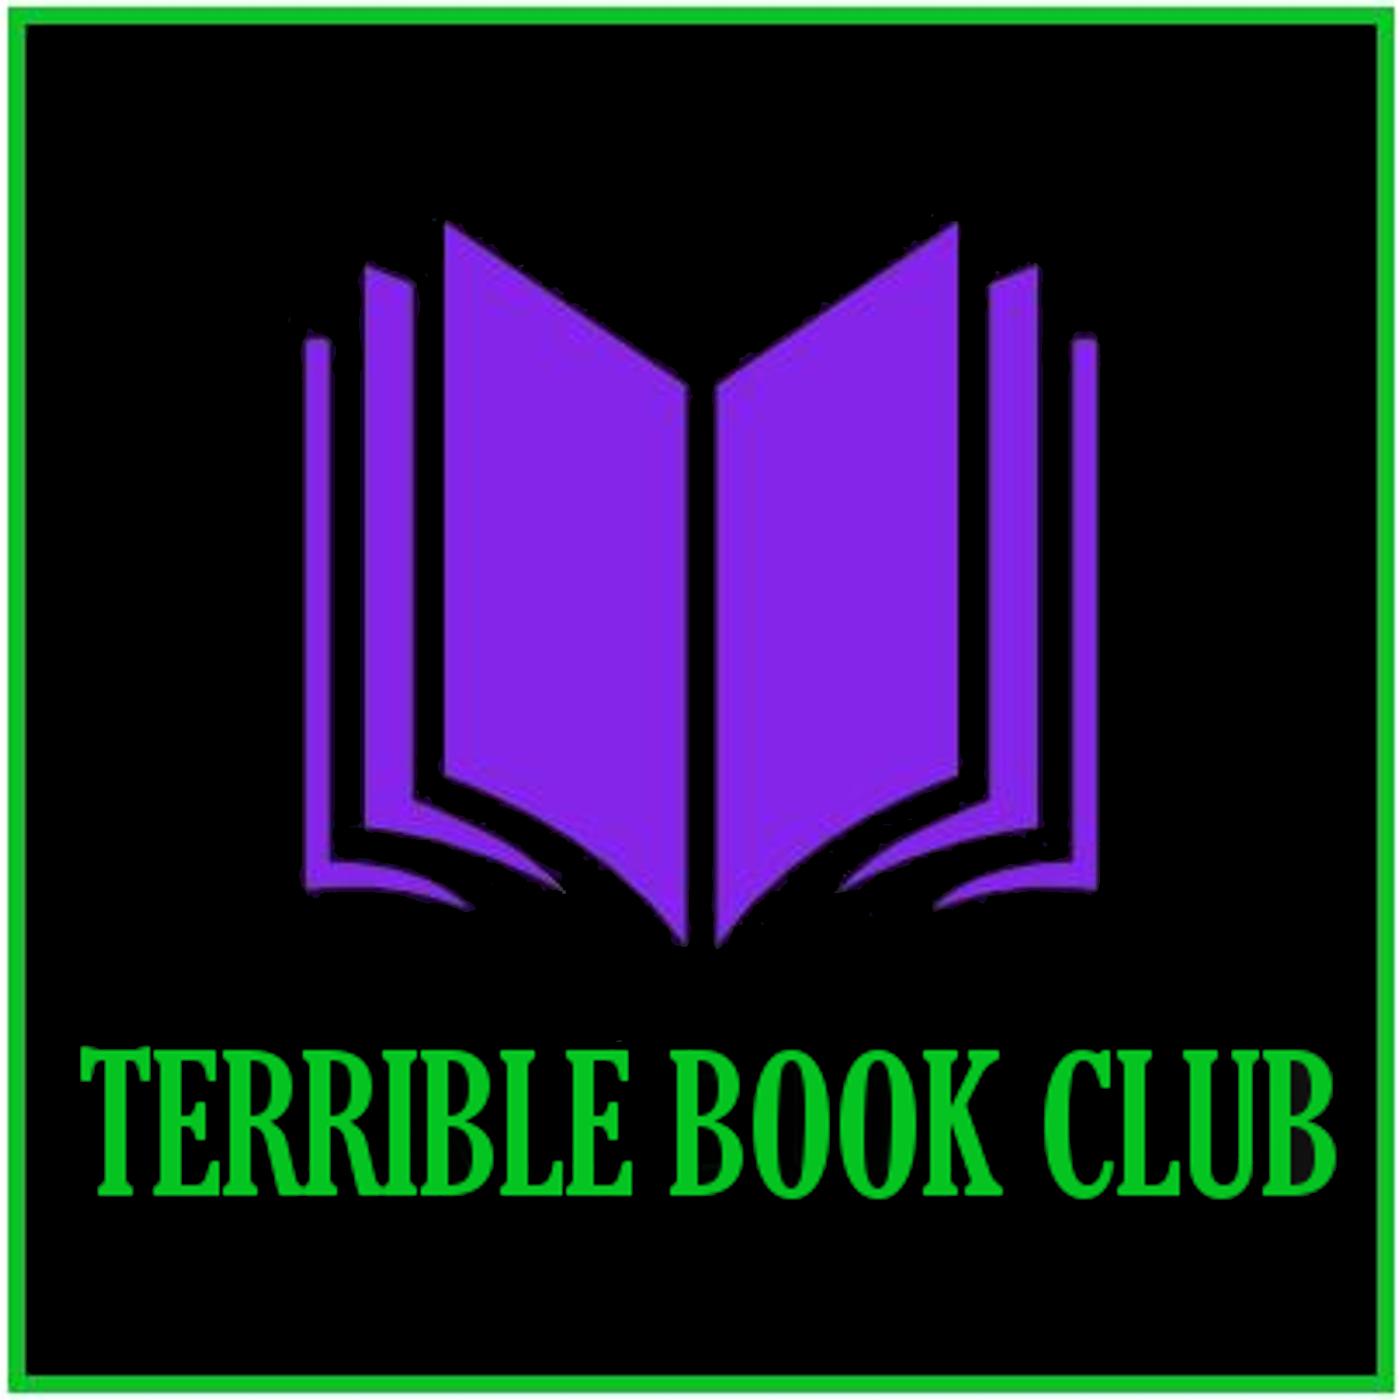 Terrible Book Club album art